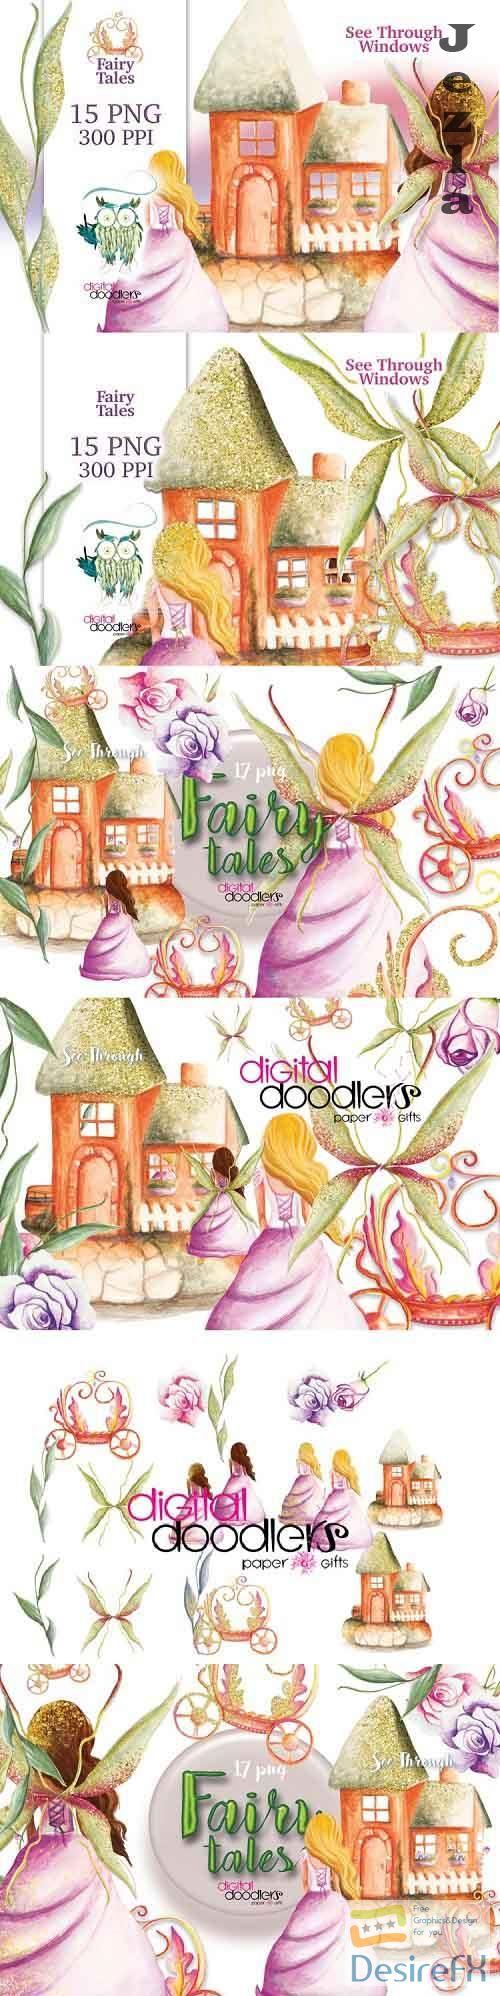 Fairy Tales - 81168